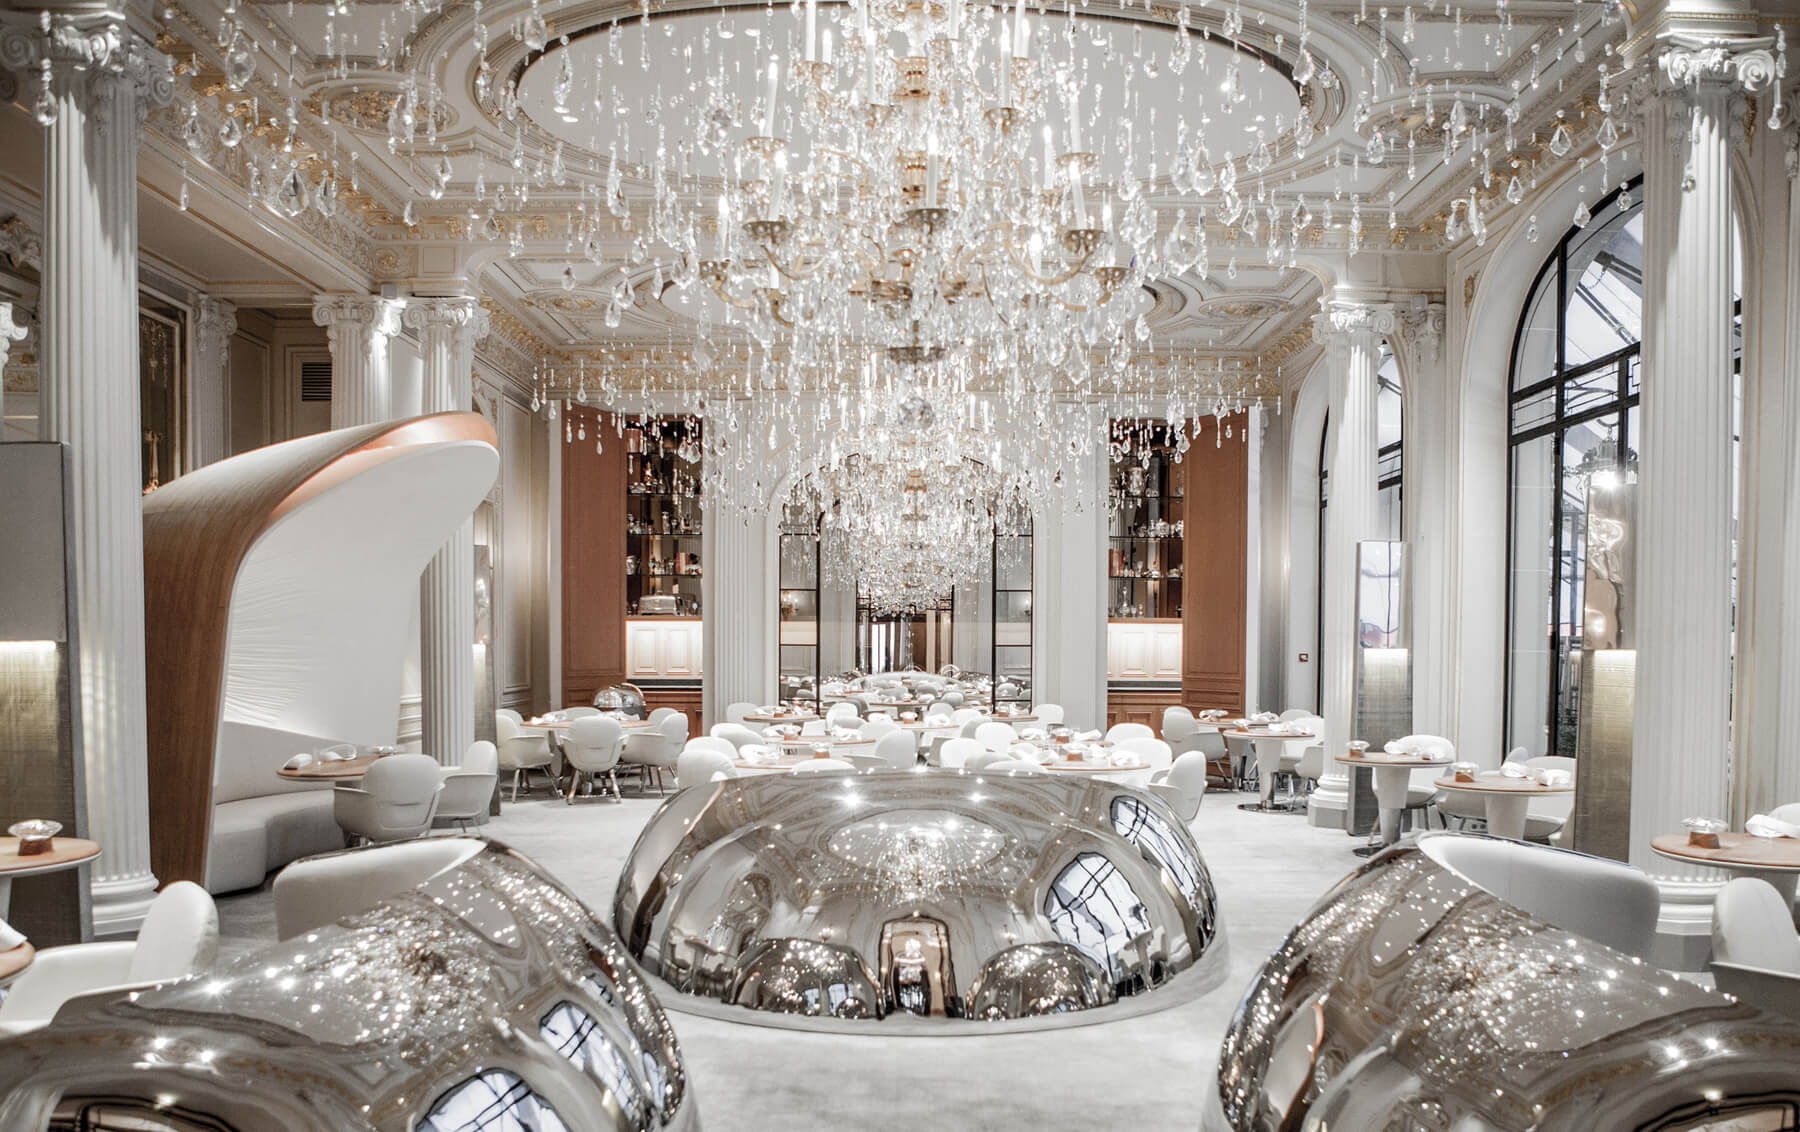 Most Expensive Restaurants - Alain Ducasse au Plaza Athenee